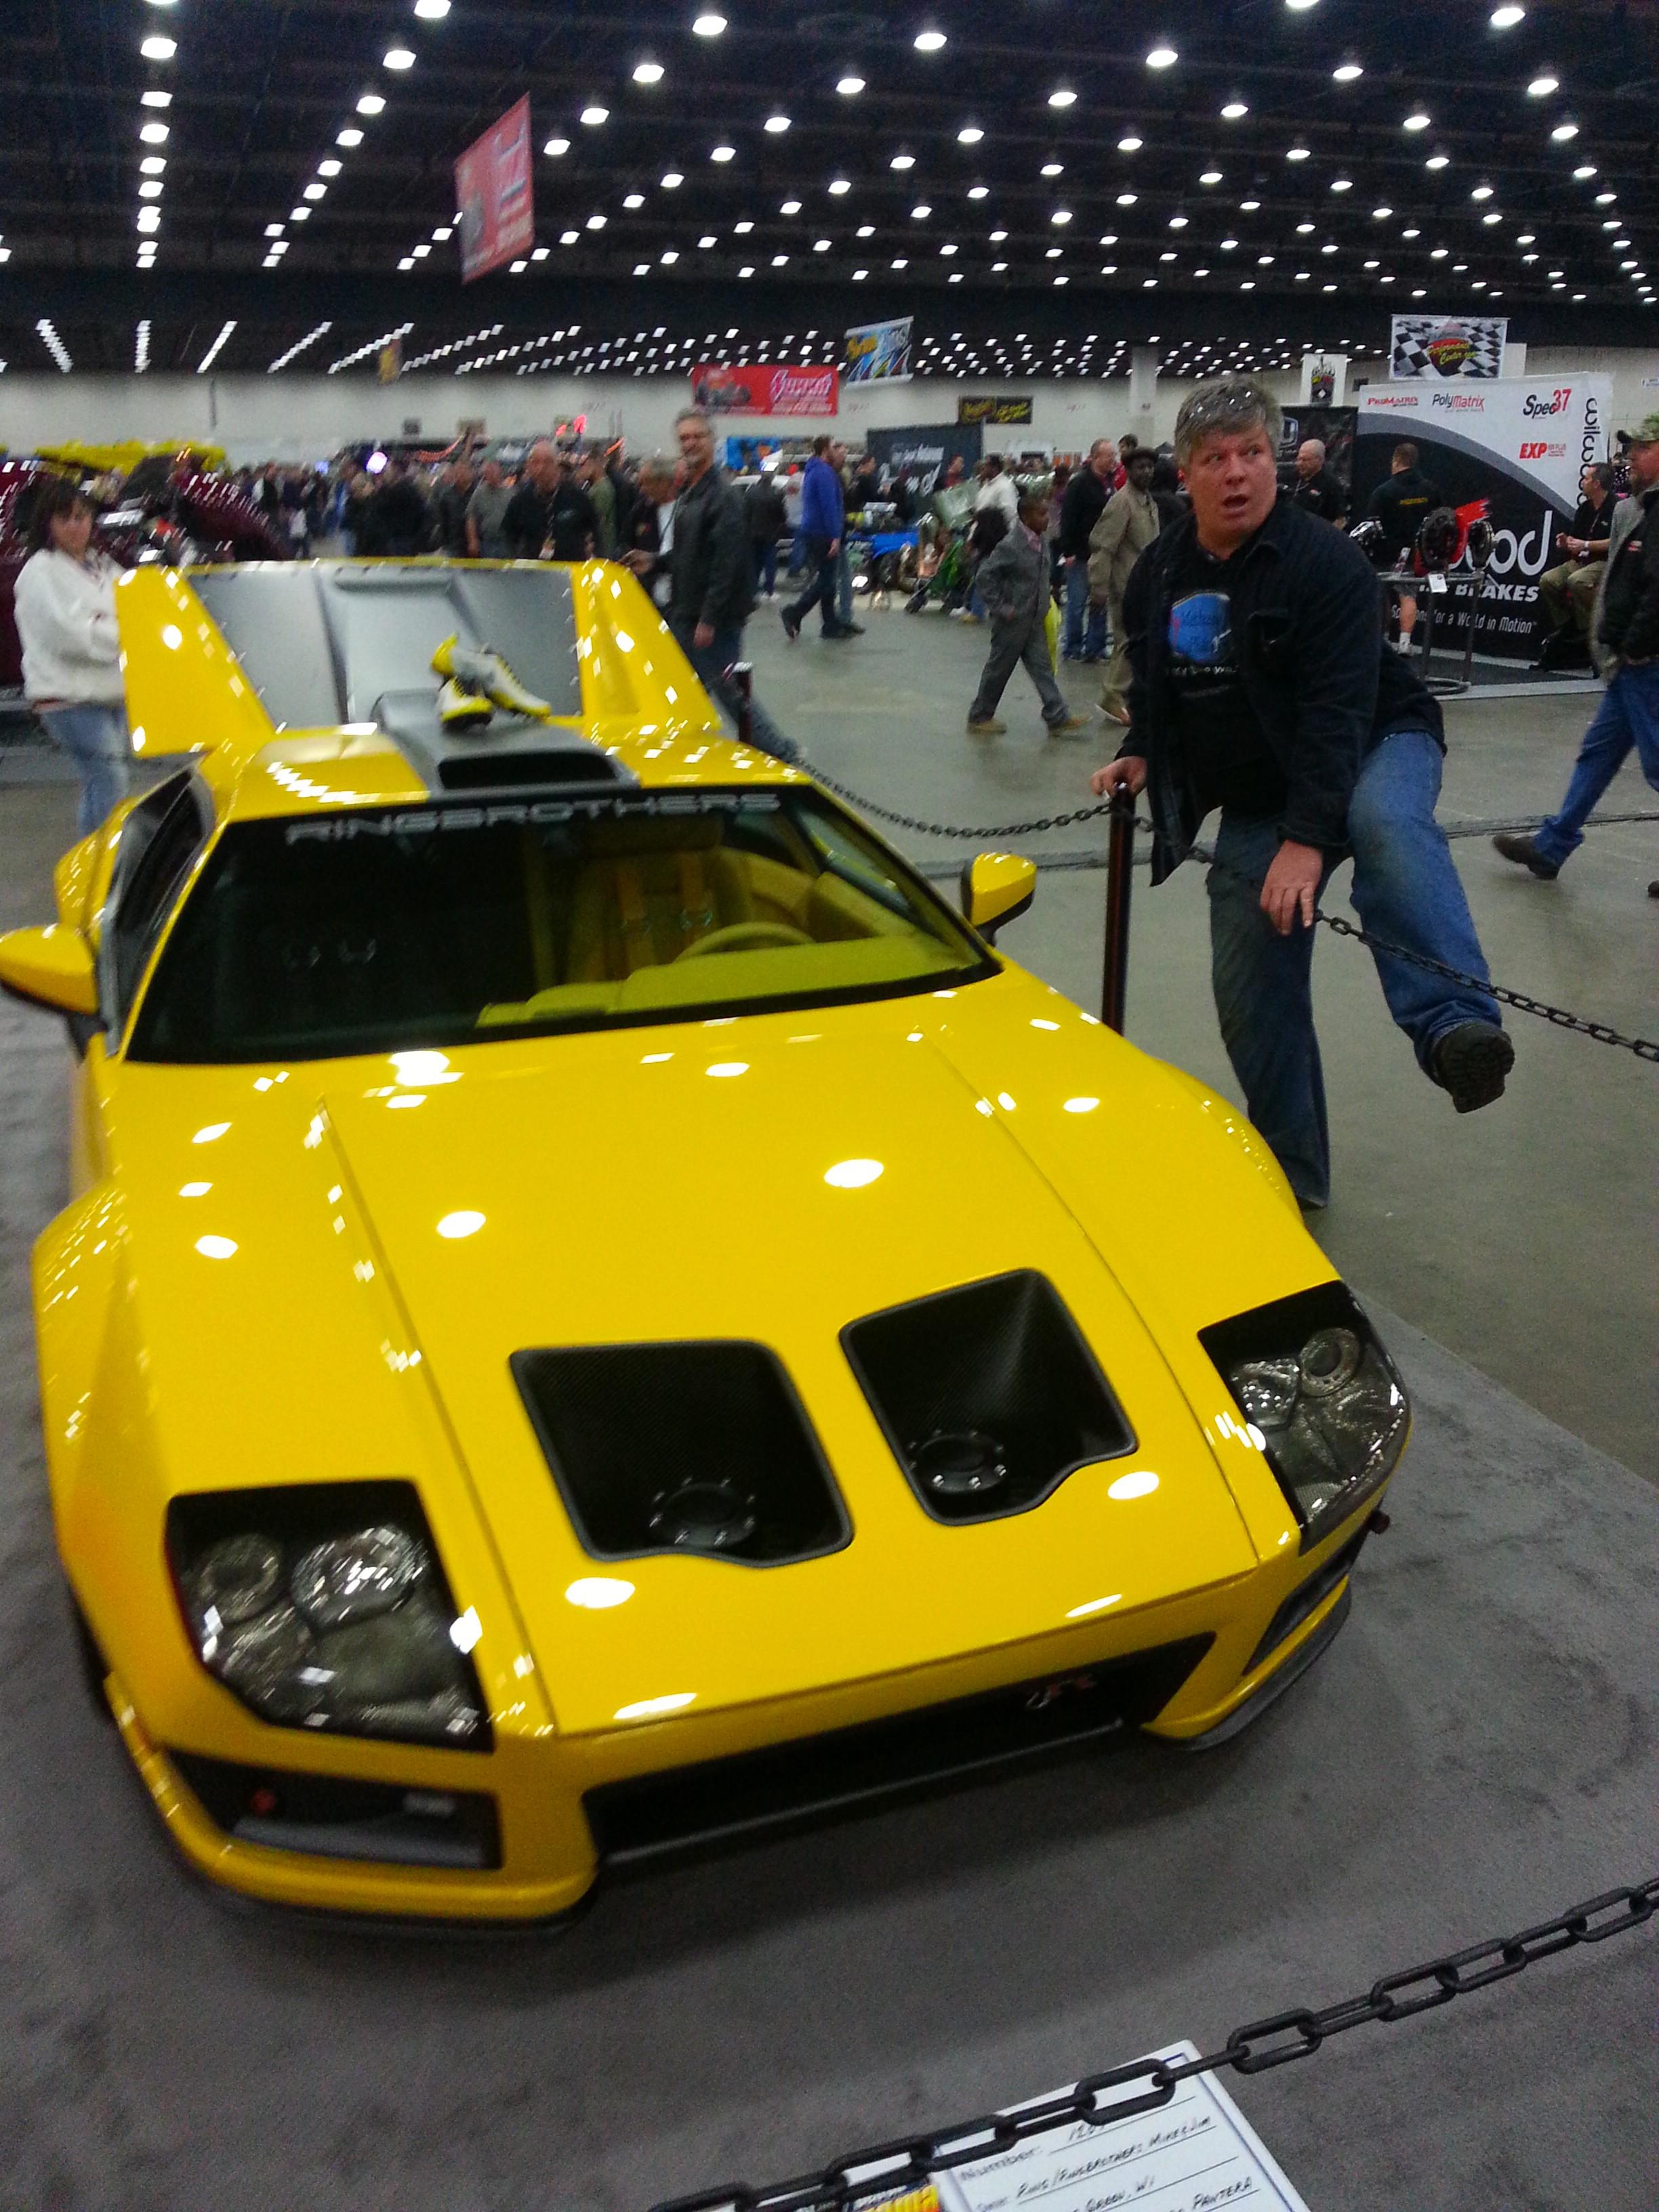 Yellow Car at MyMechanicsPlace.com